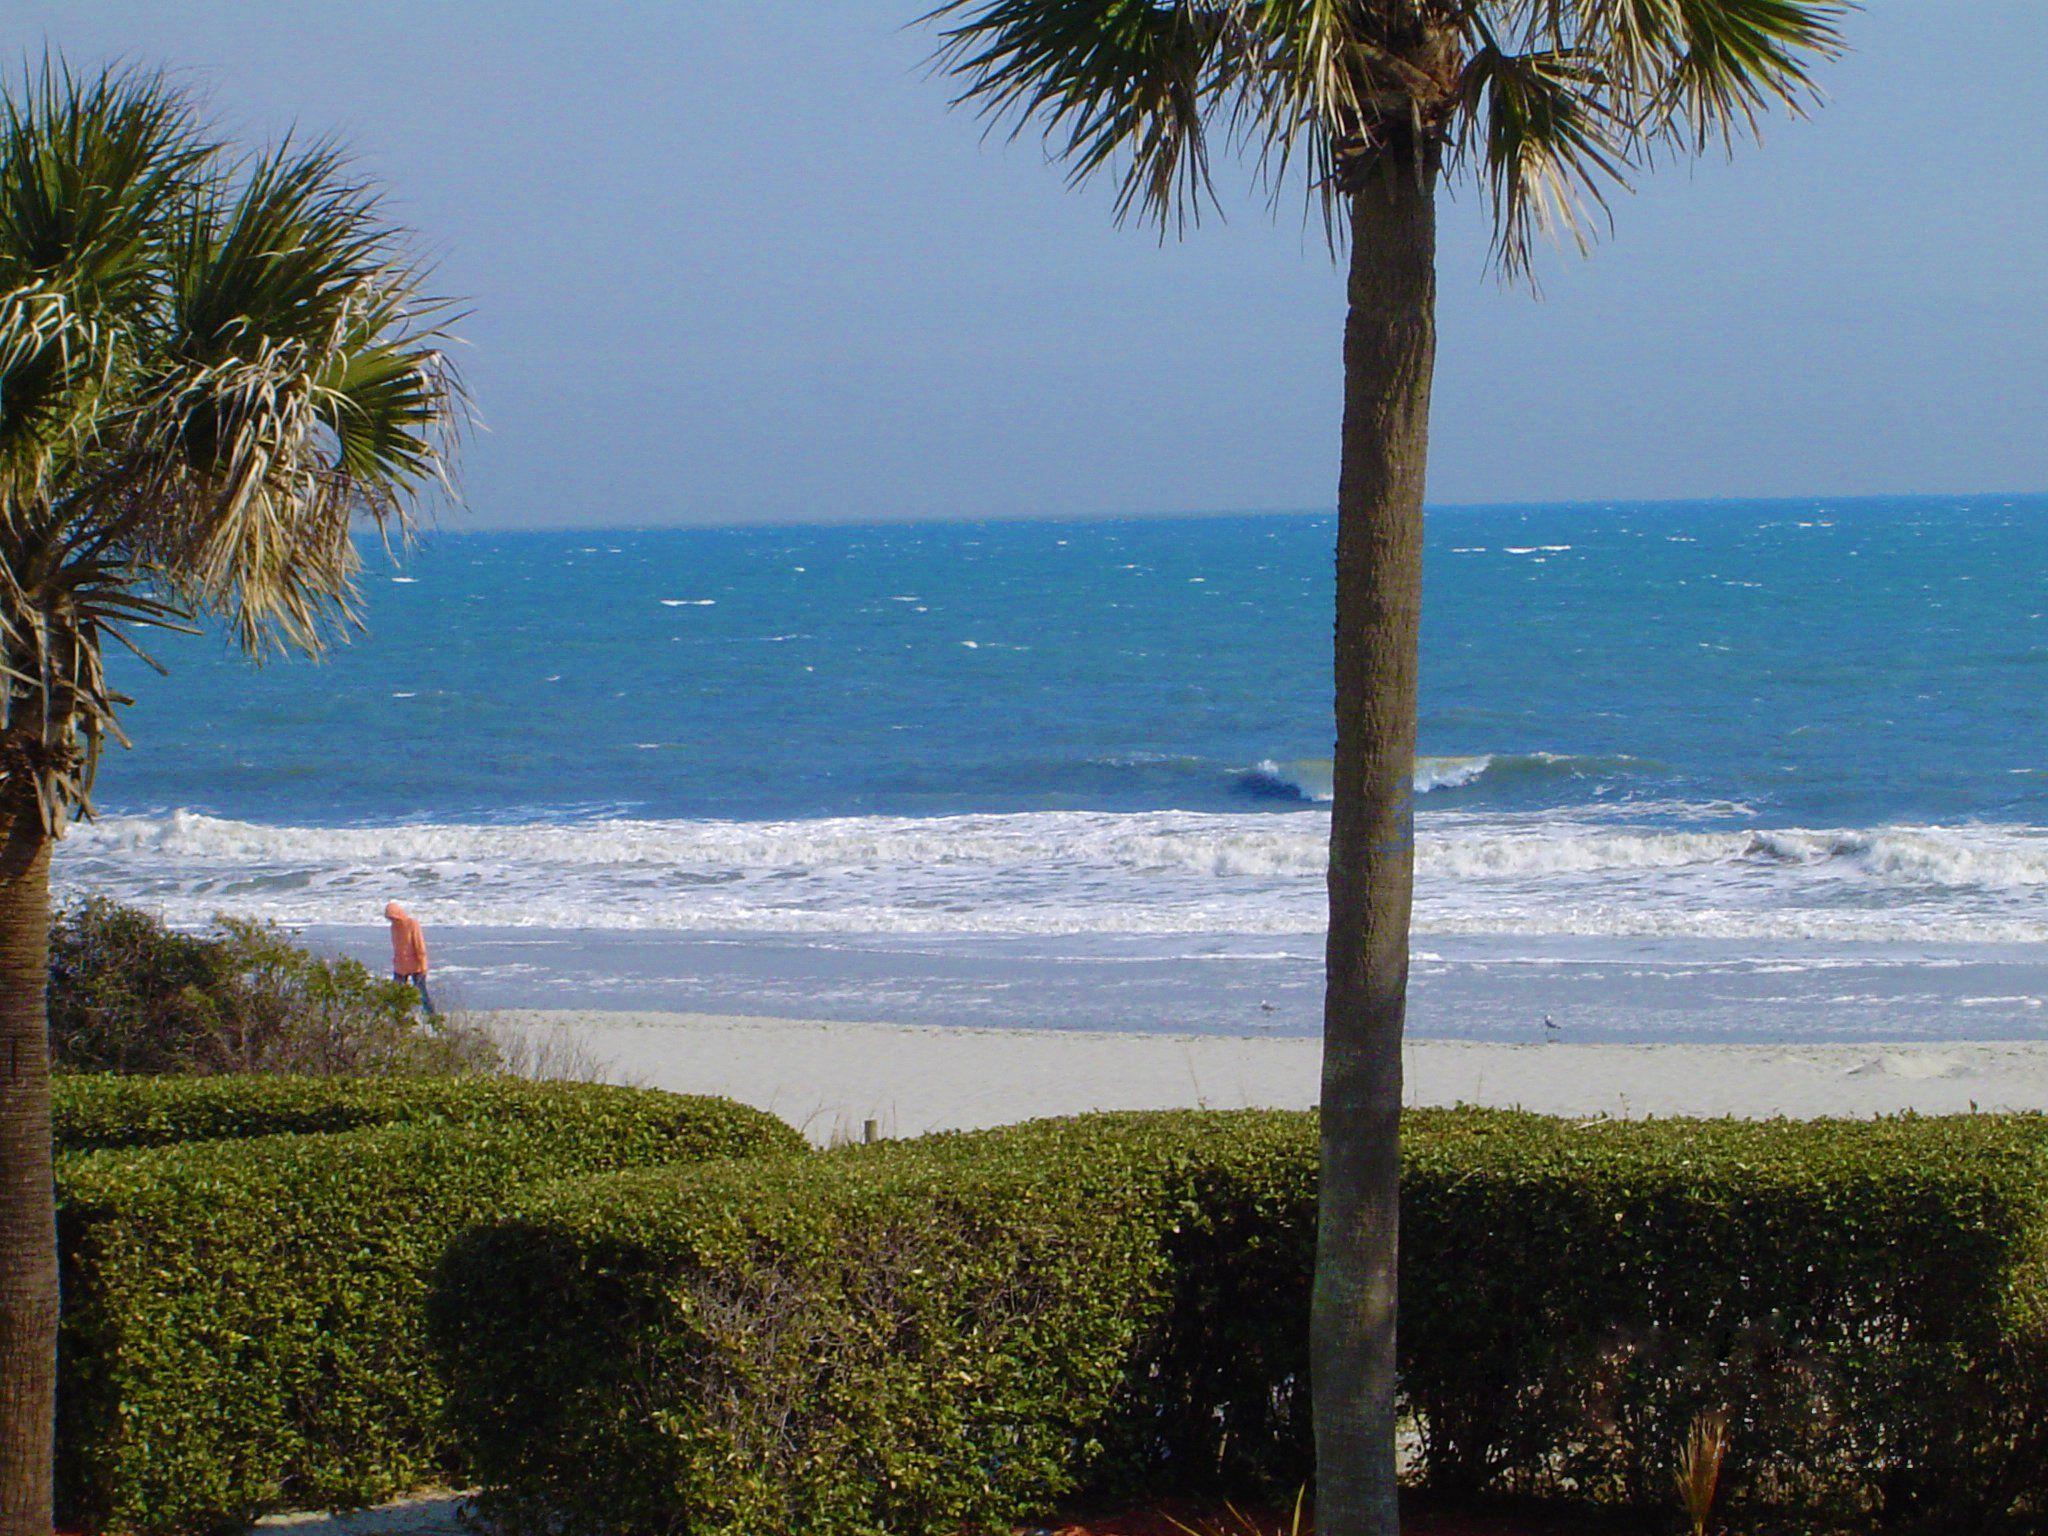 A View From Grande Shores In Myrtle Beach South Carolina Myrtle Beach Hotels Ocean Resort Myrtle Beach